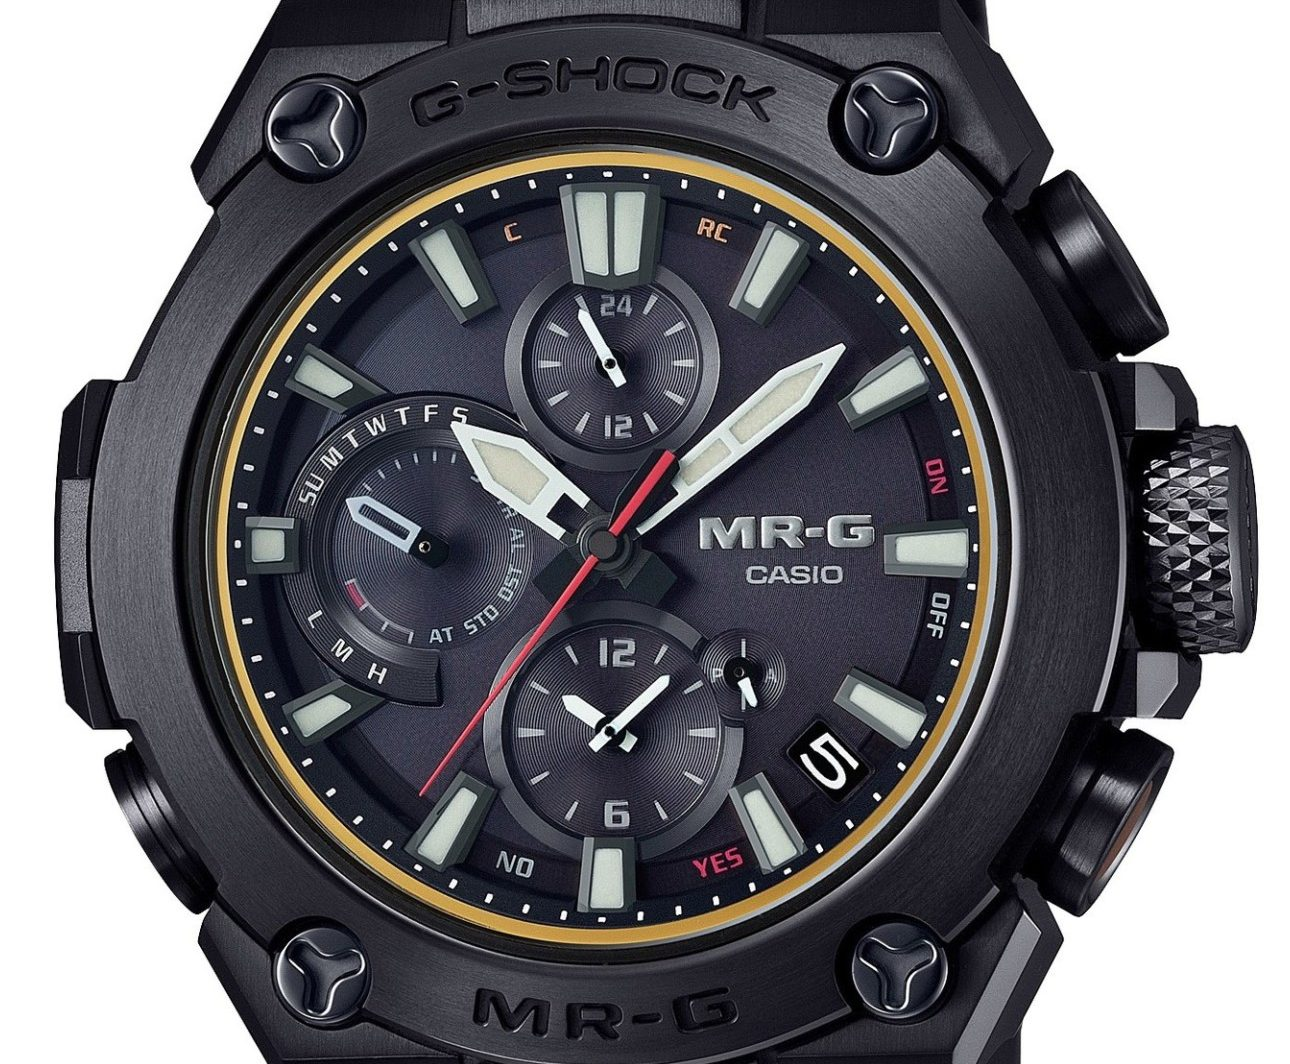 MRG-B1000B-1A-JR